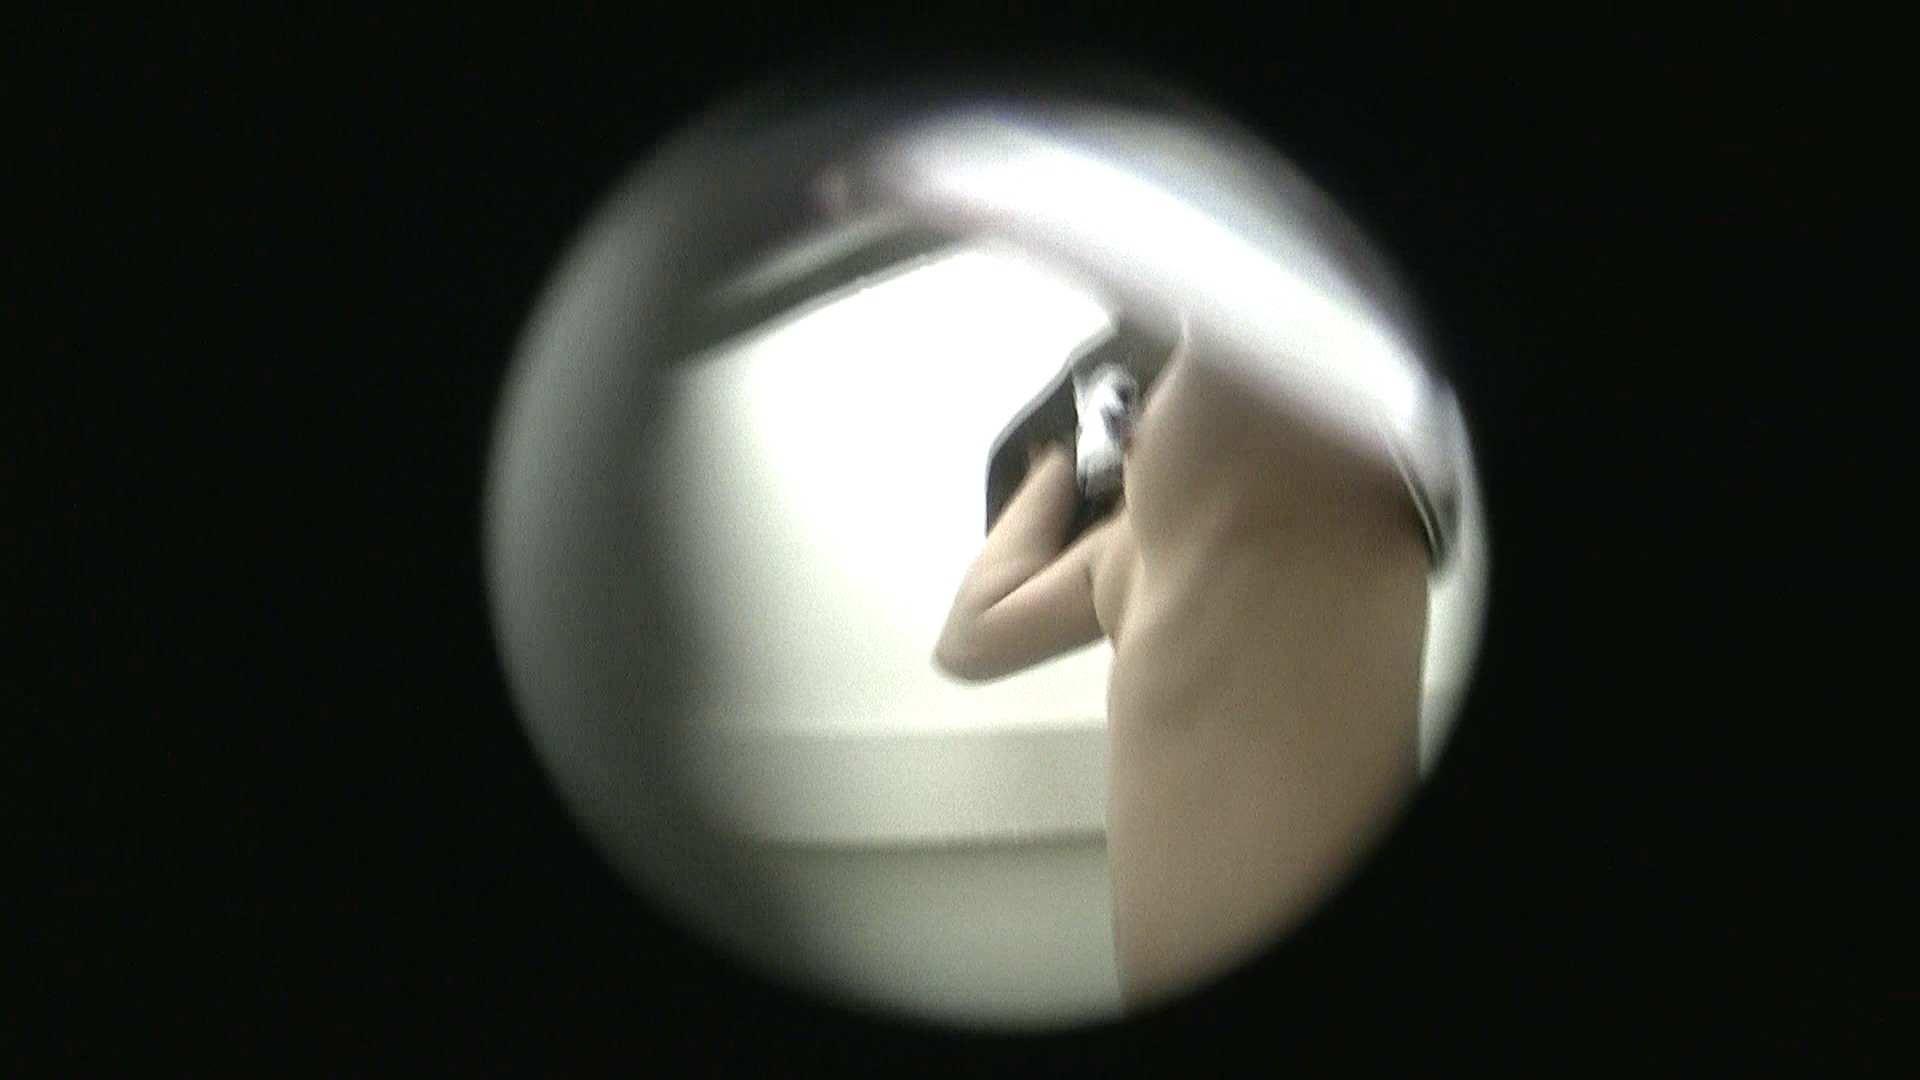 NO.22 何をニヤニヤしているのやら【MKB10位】 細身体型 エロ無料画像 100枚 74